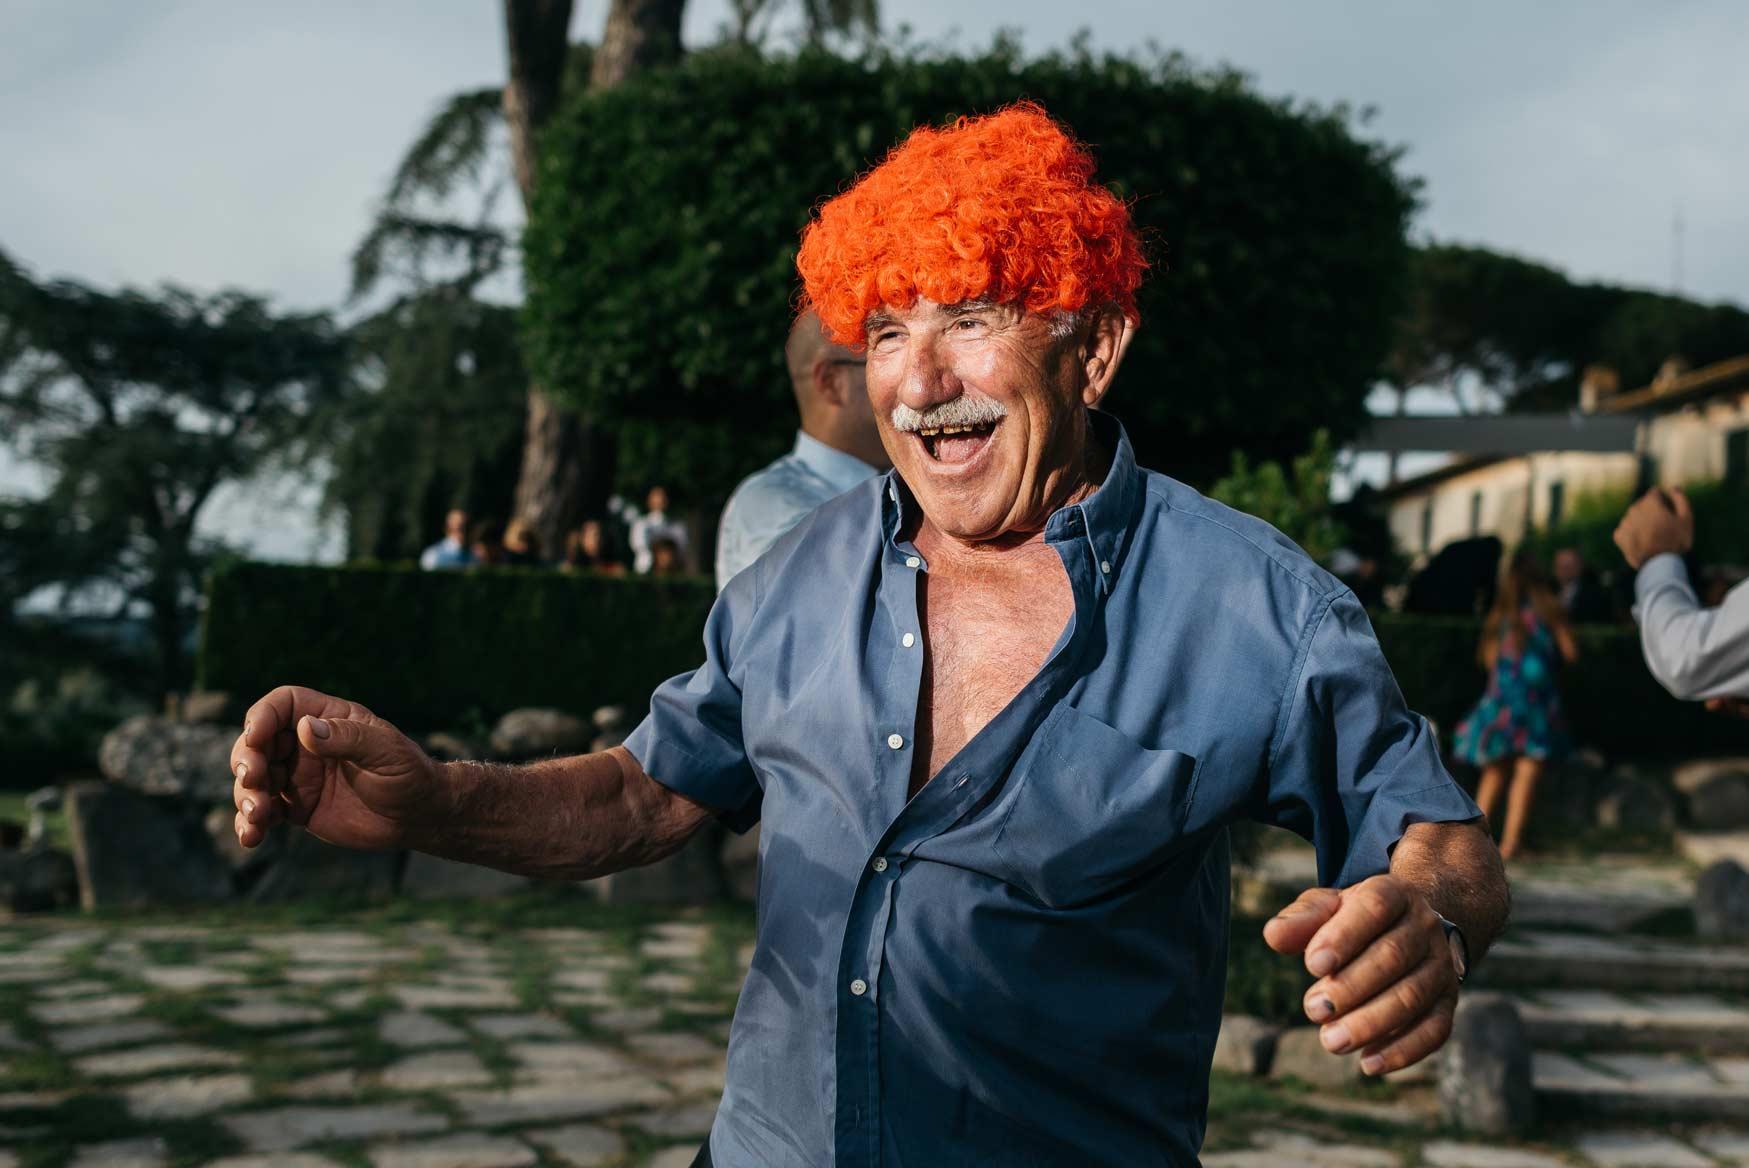 Fotografo-Matrimonio-Roma-Reportage-Festa